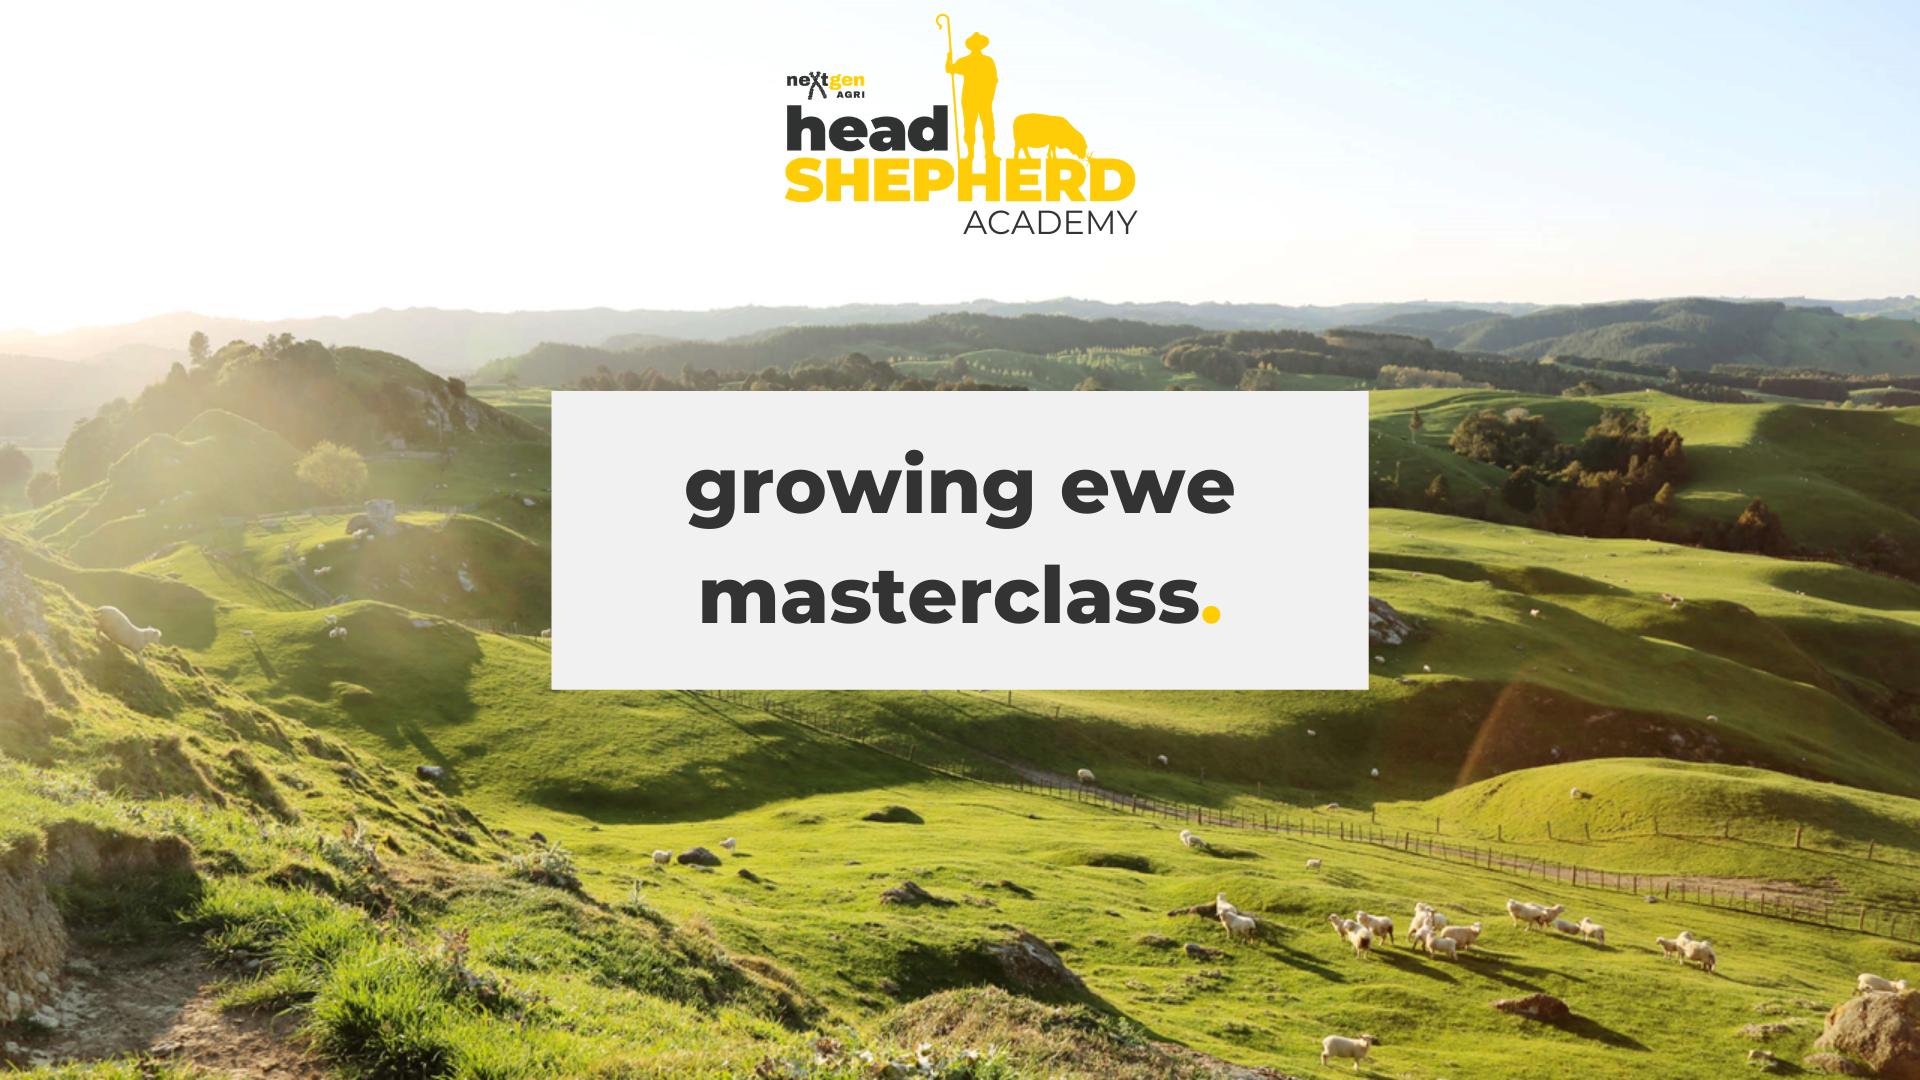 Growing Ewe Masterclass with neXtgen Agri